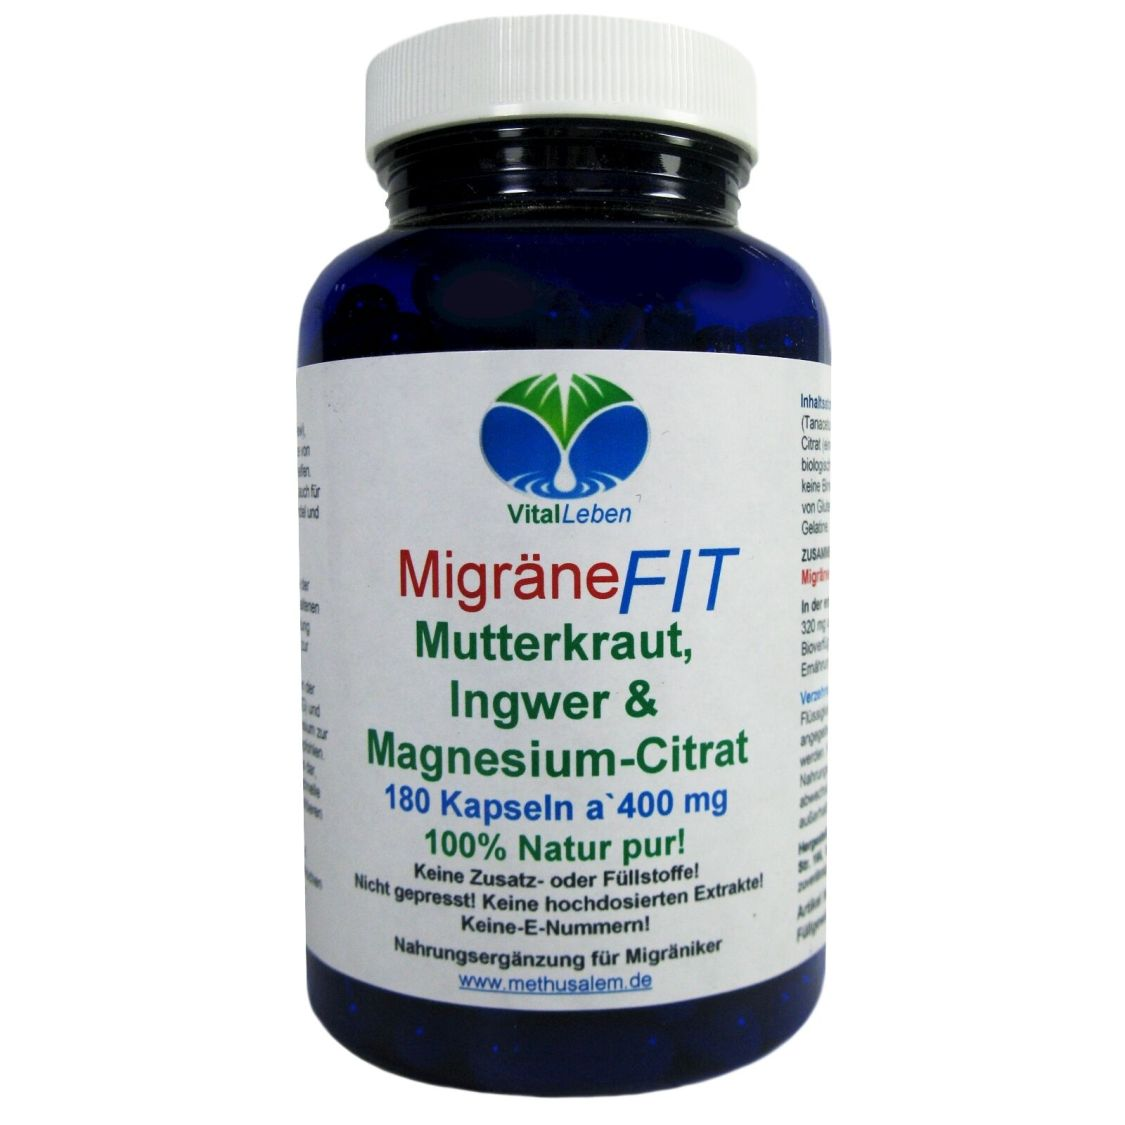 MigräneFIT Mutterkraut Ingwer & Magnesium-Citrat 180 Kapseln Natur Pur #25767